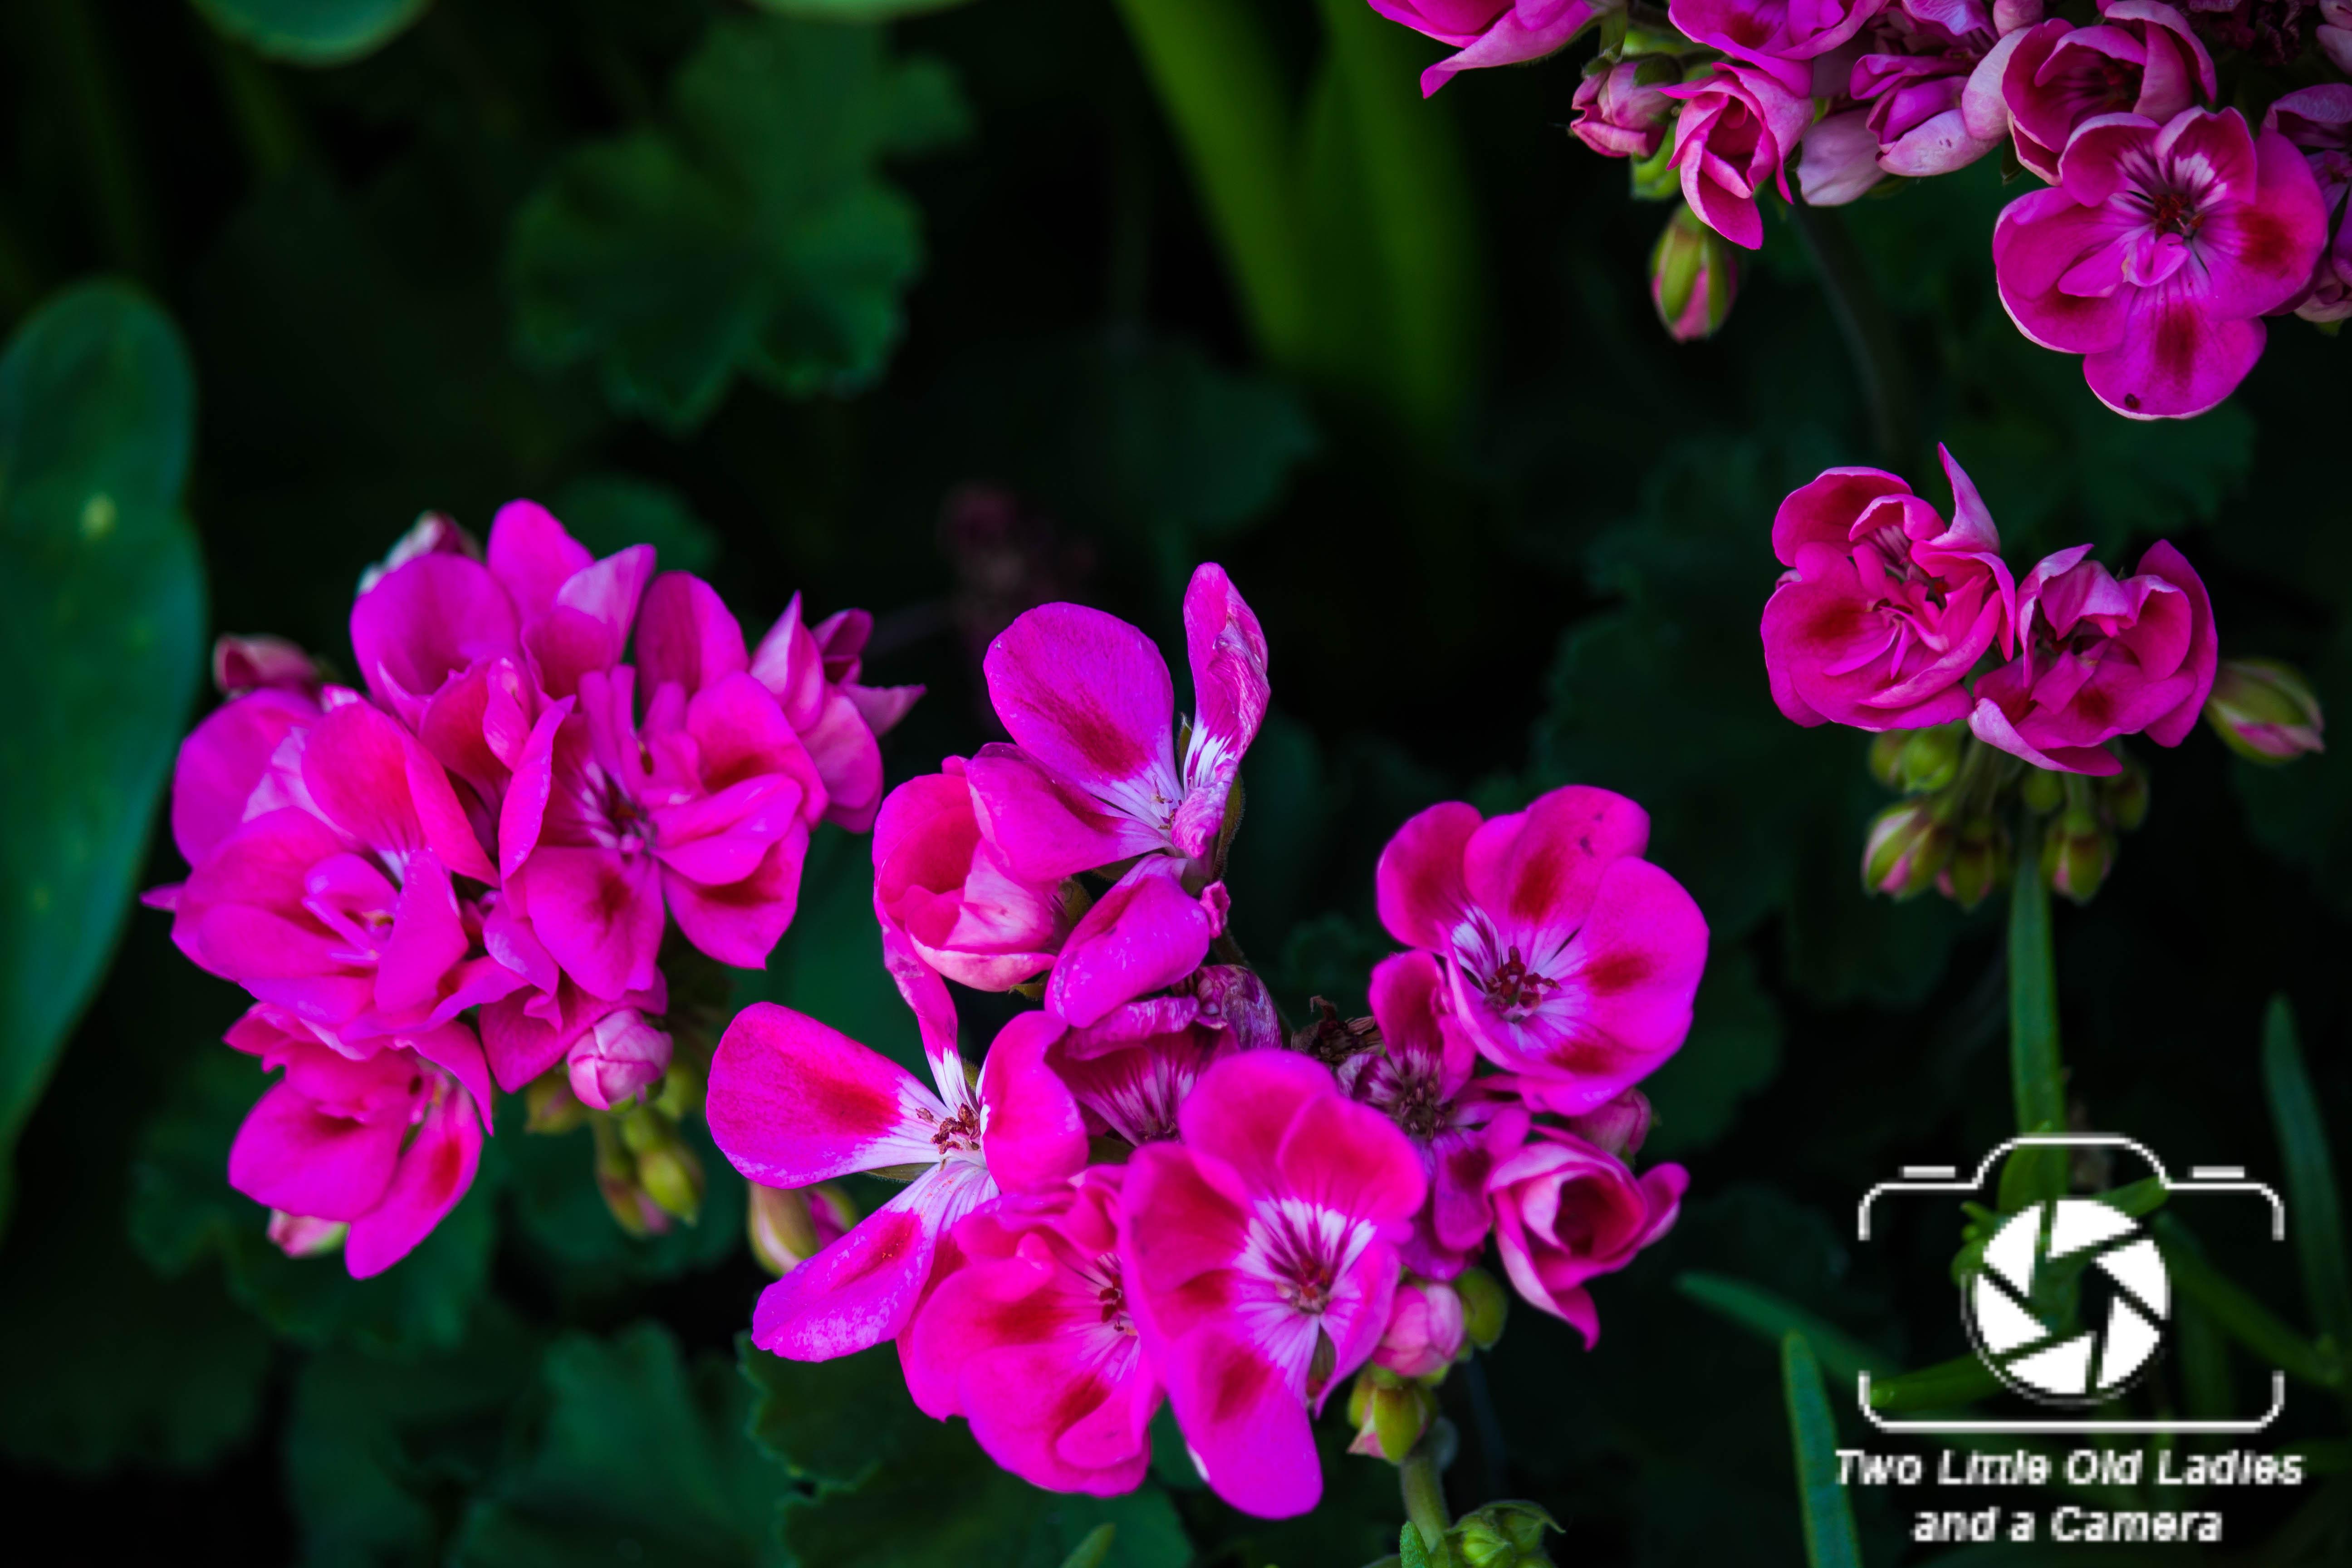 Flowers at Thai Chiang Mai Restaurant